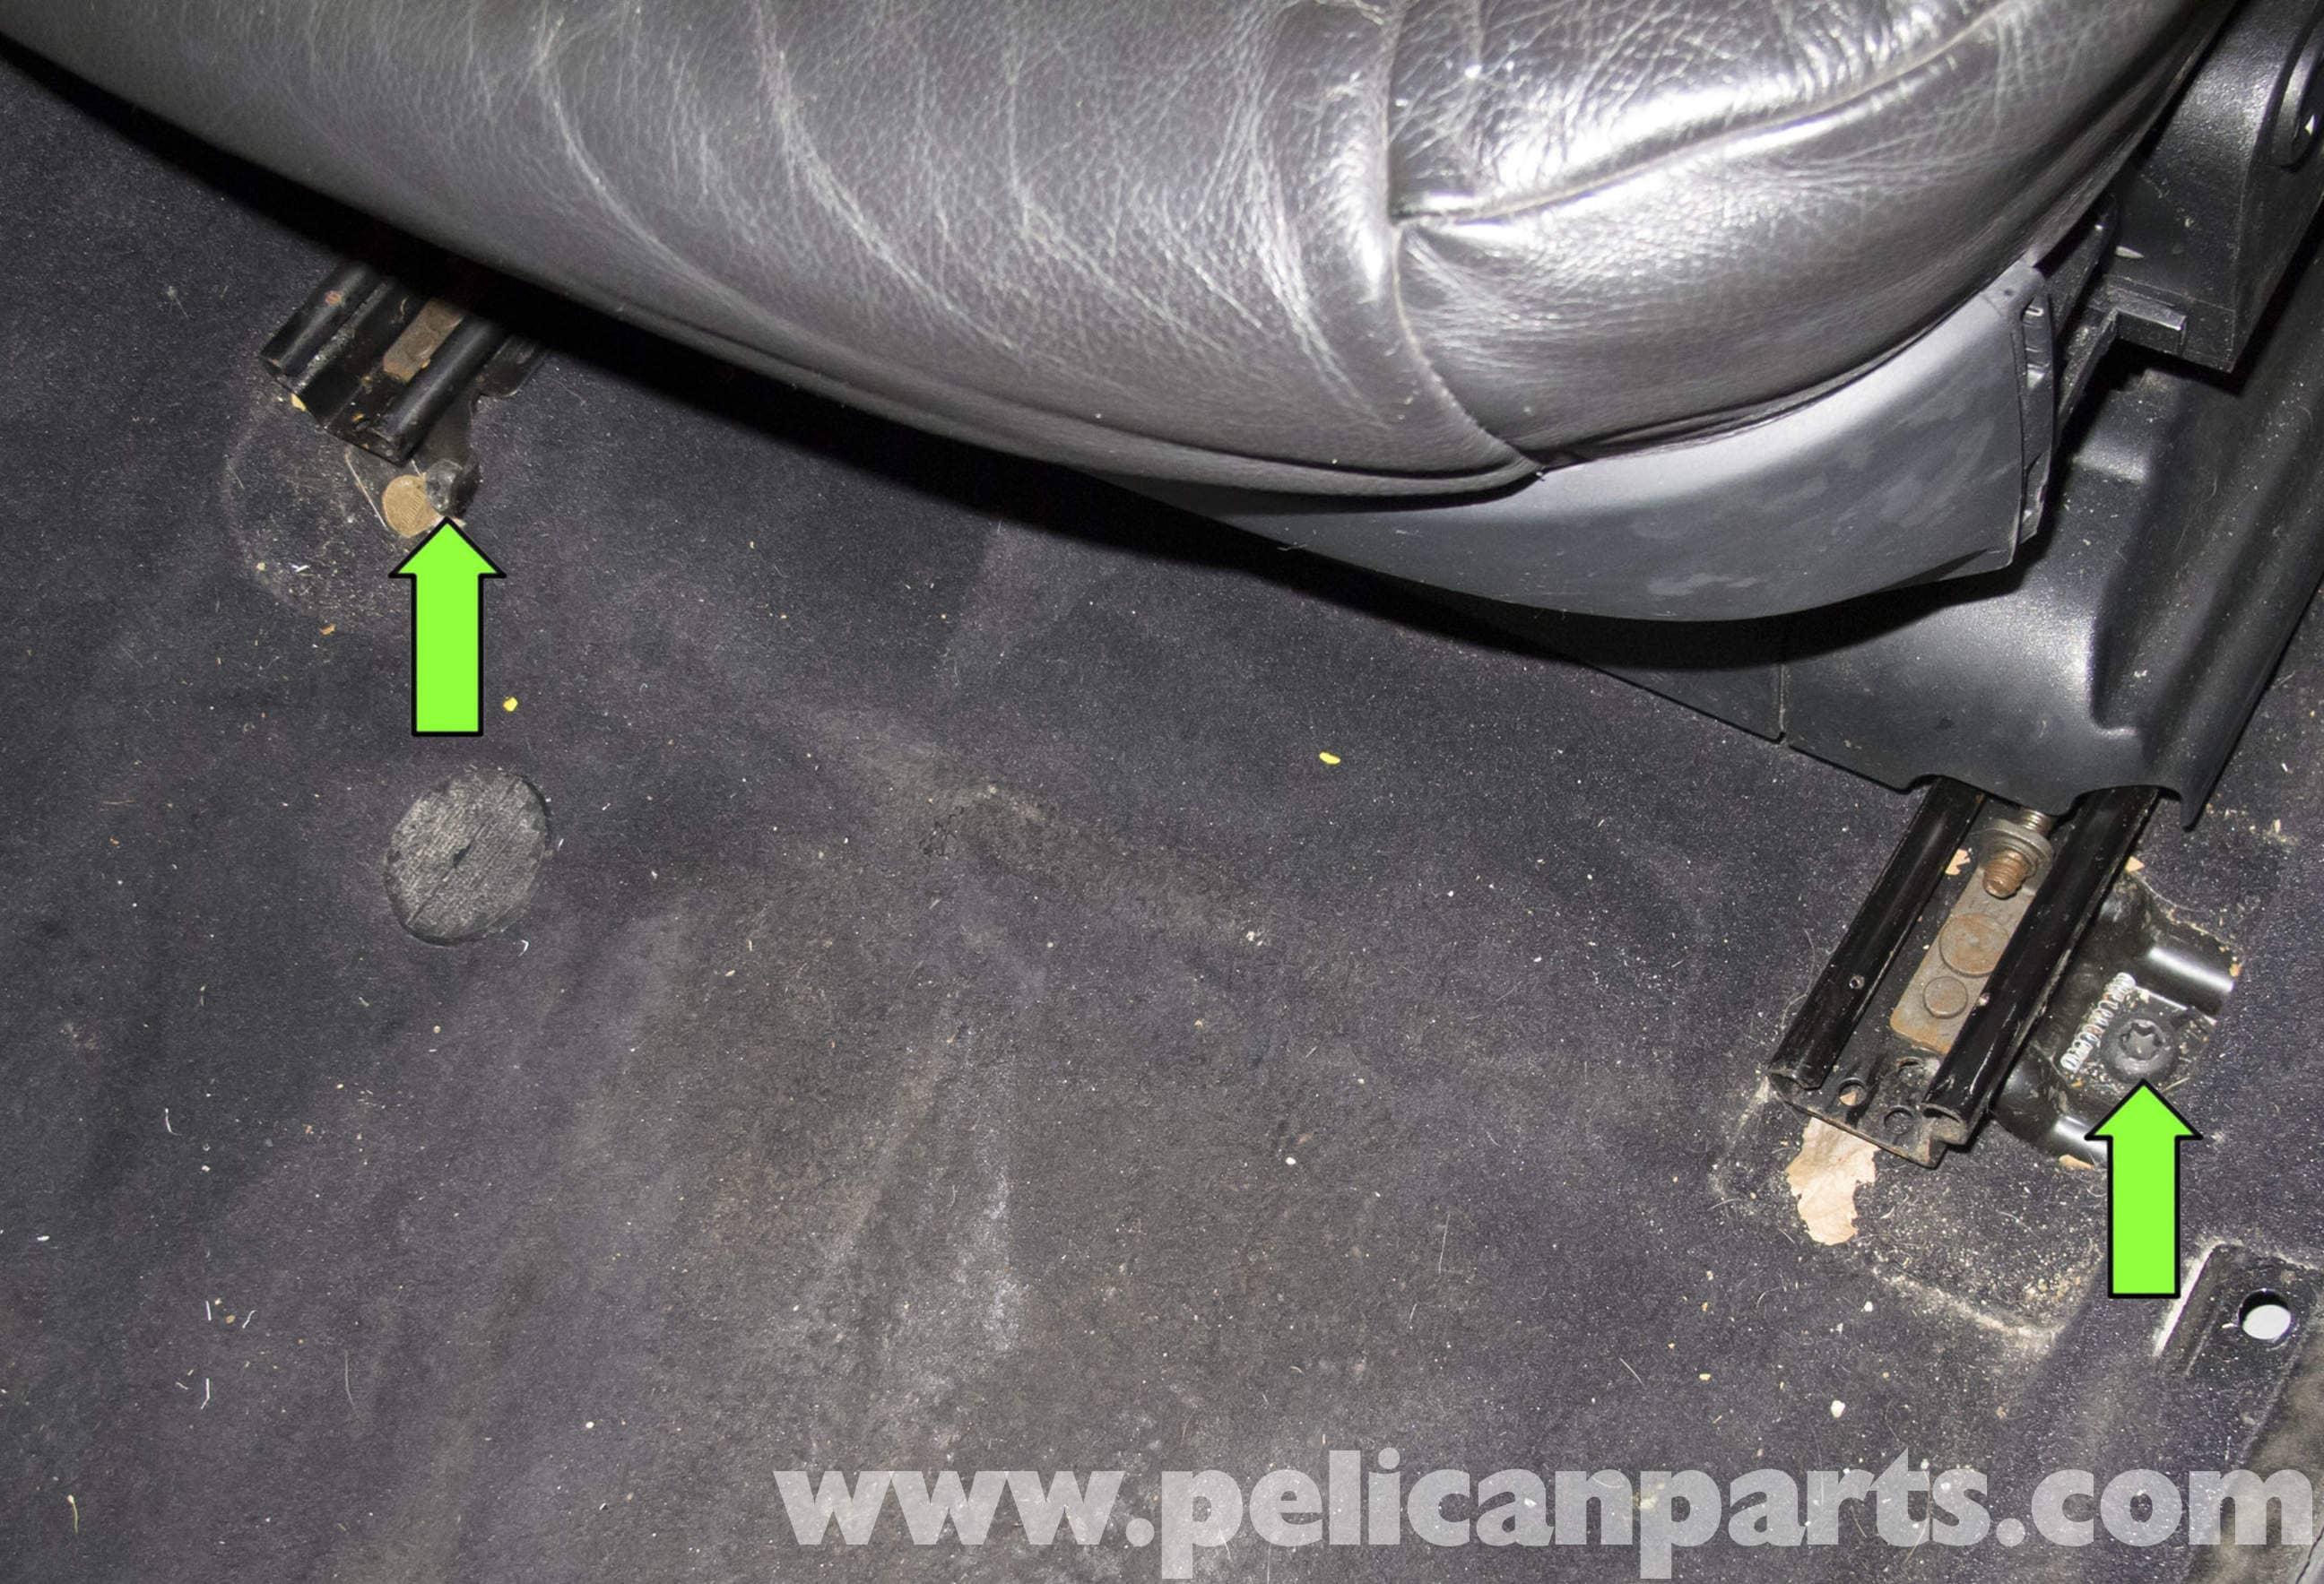 Bmw 5 Series Seats Removal E60 2004 2010 Pelican Parts Diy Maintenance Article